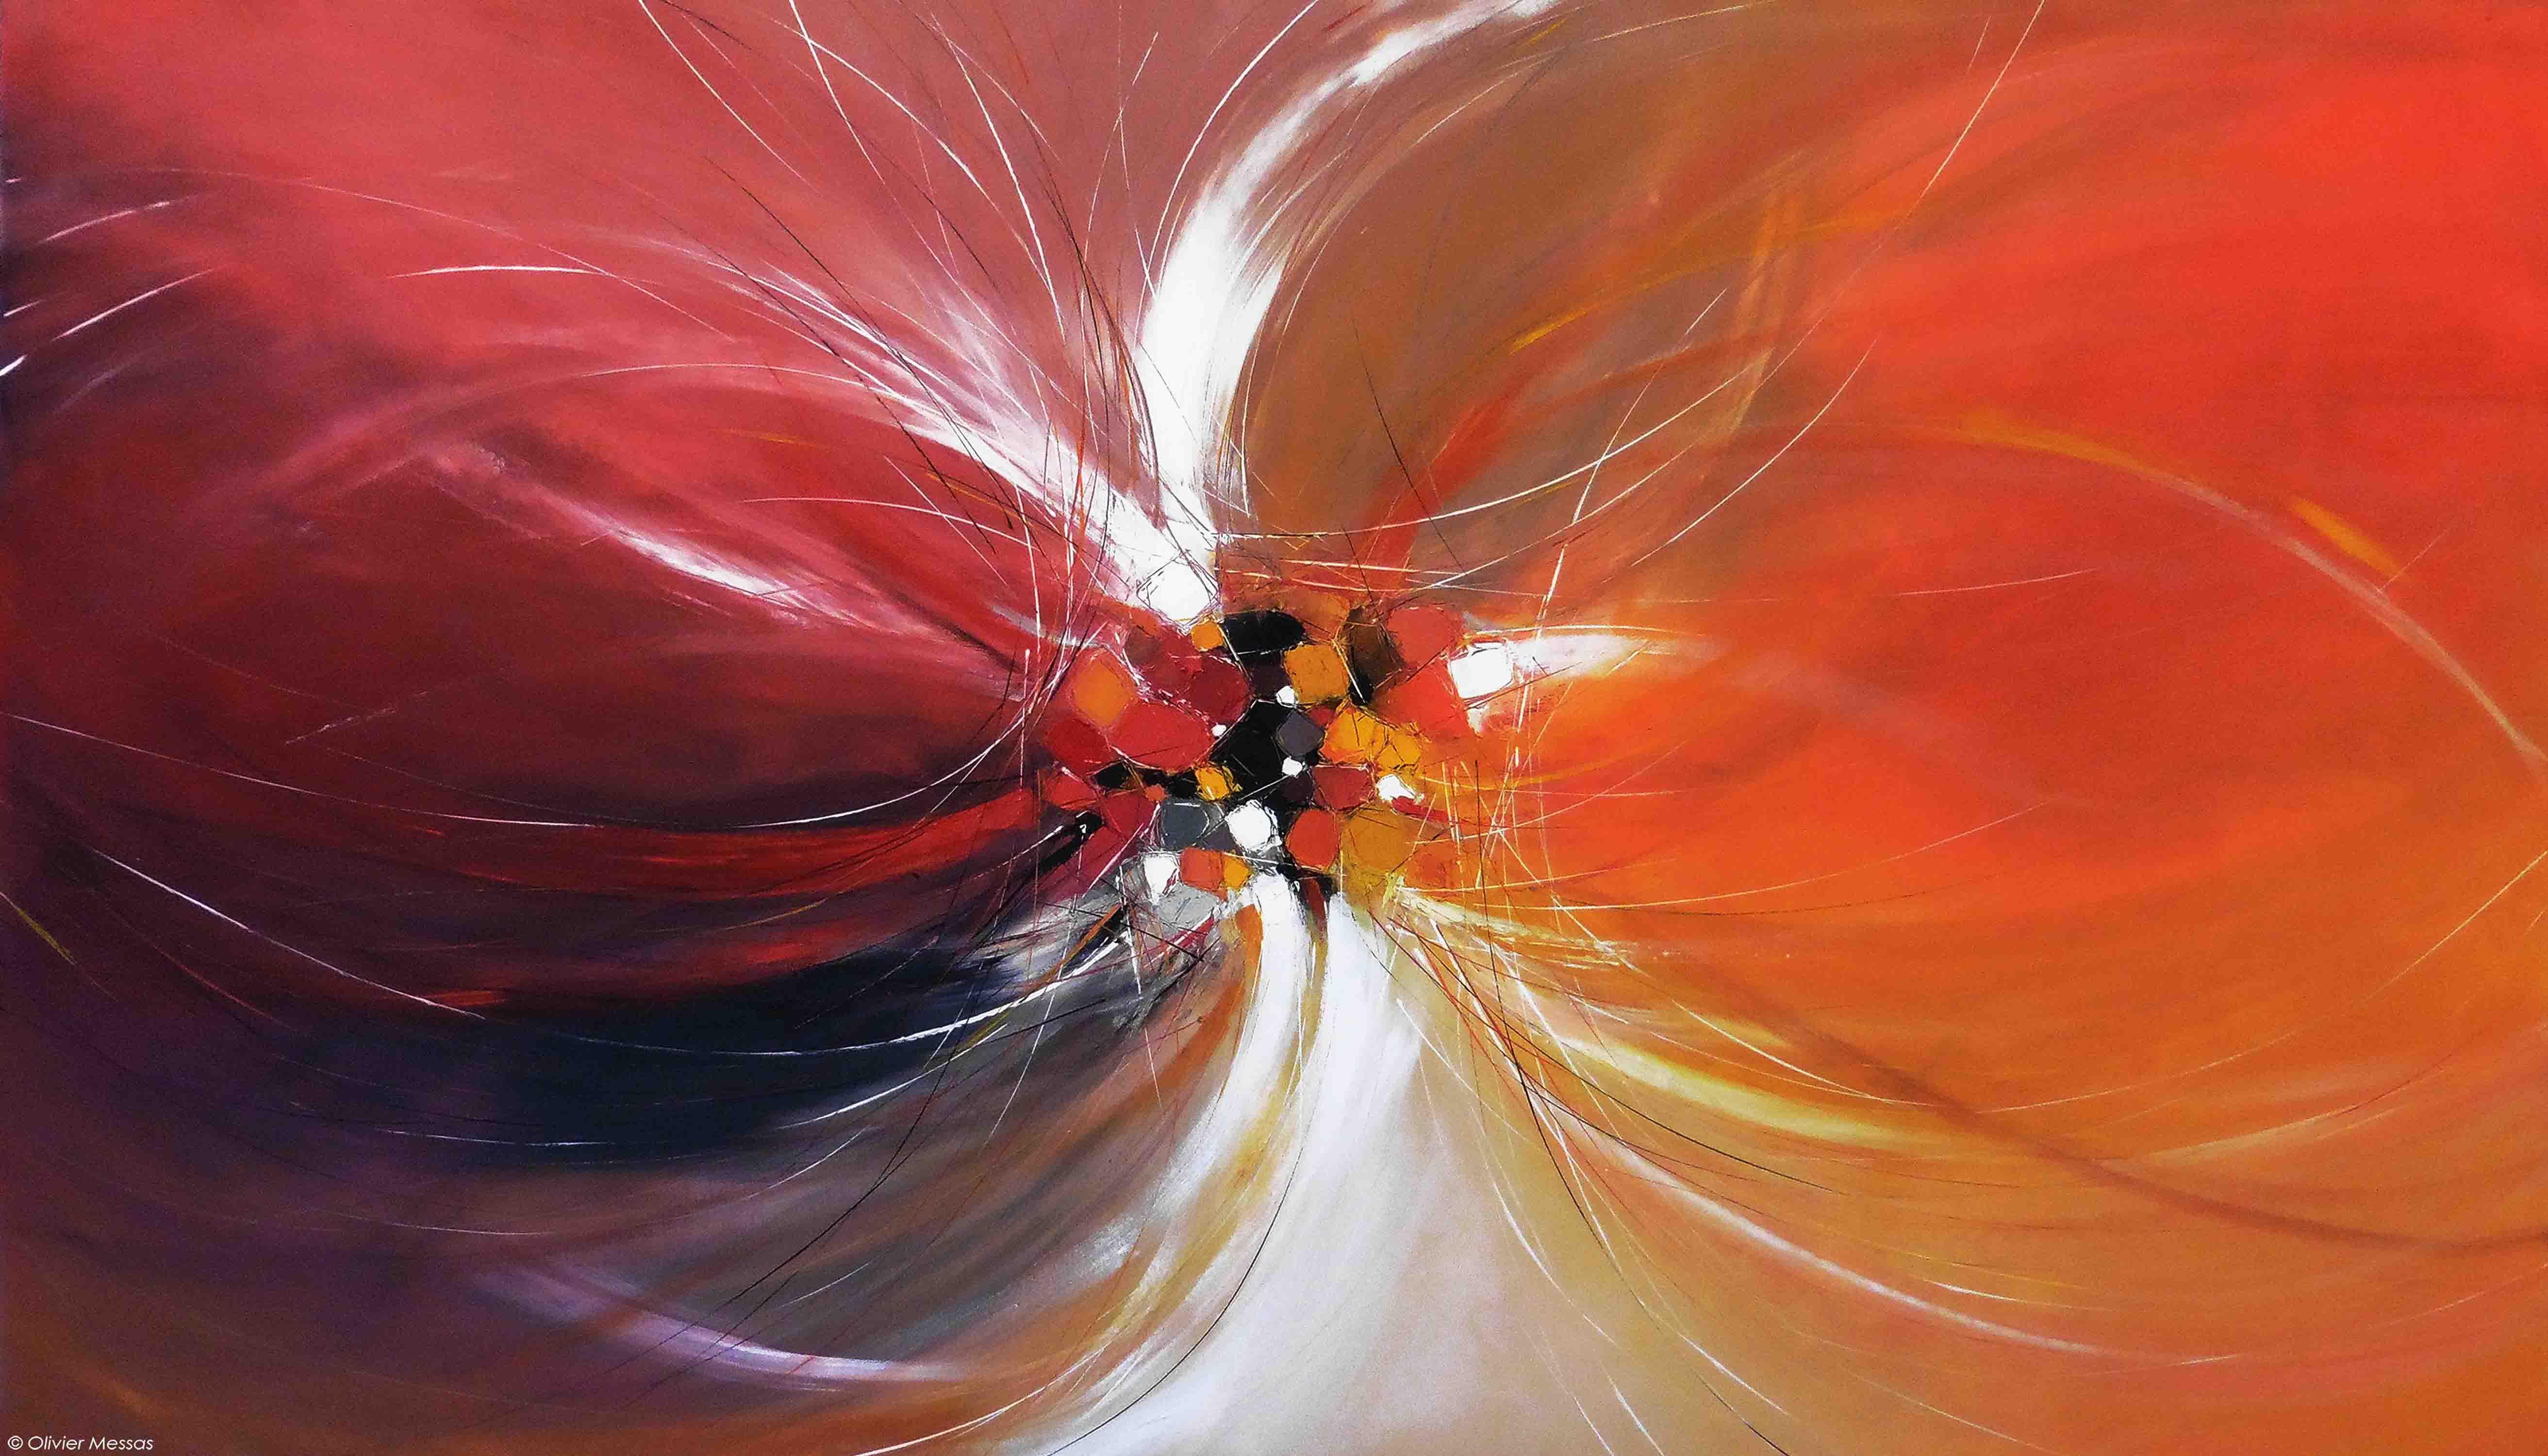 Expression libre - 100x170cm